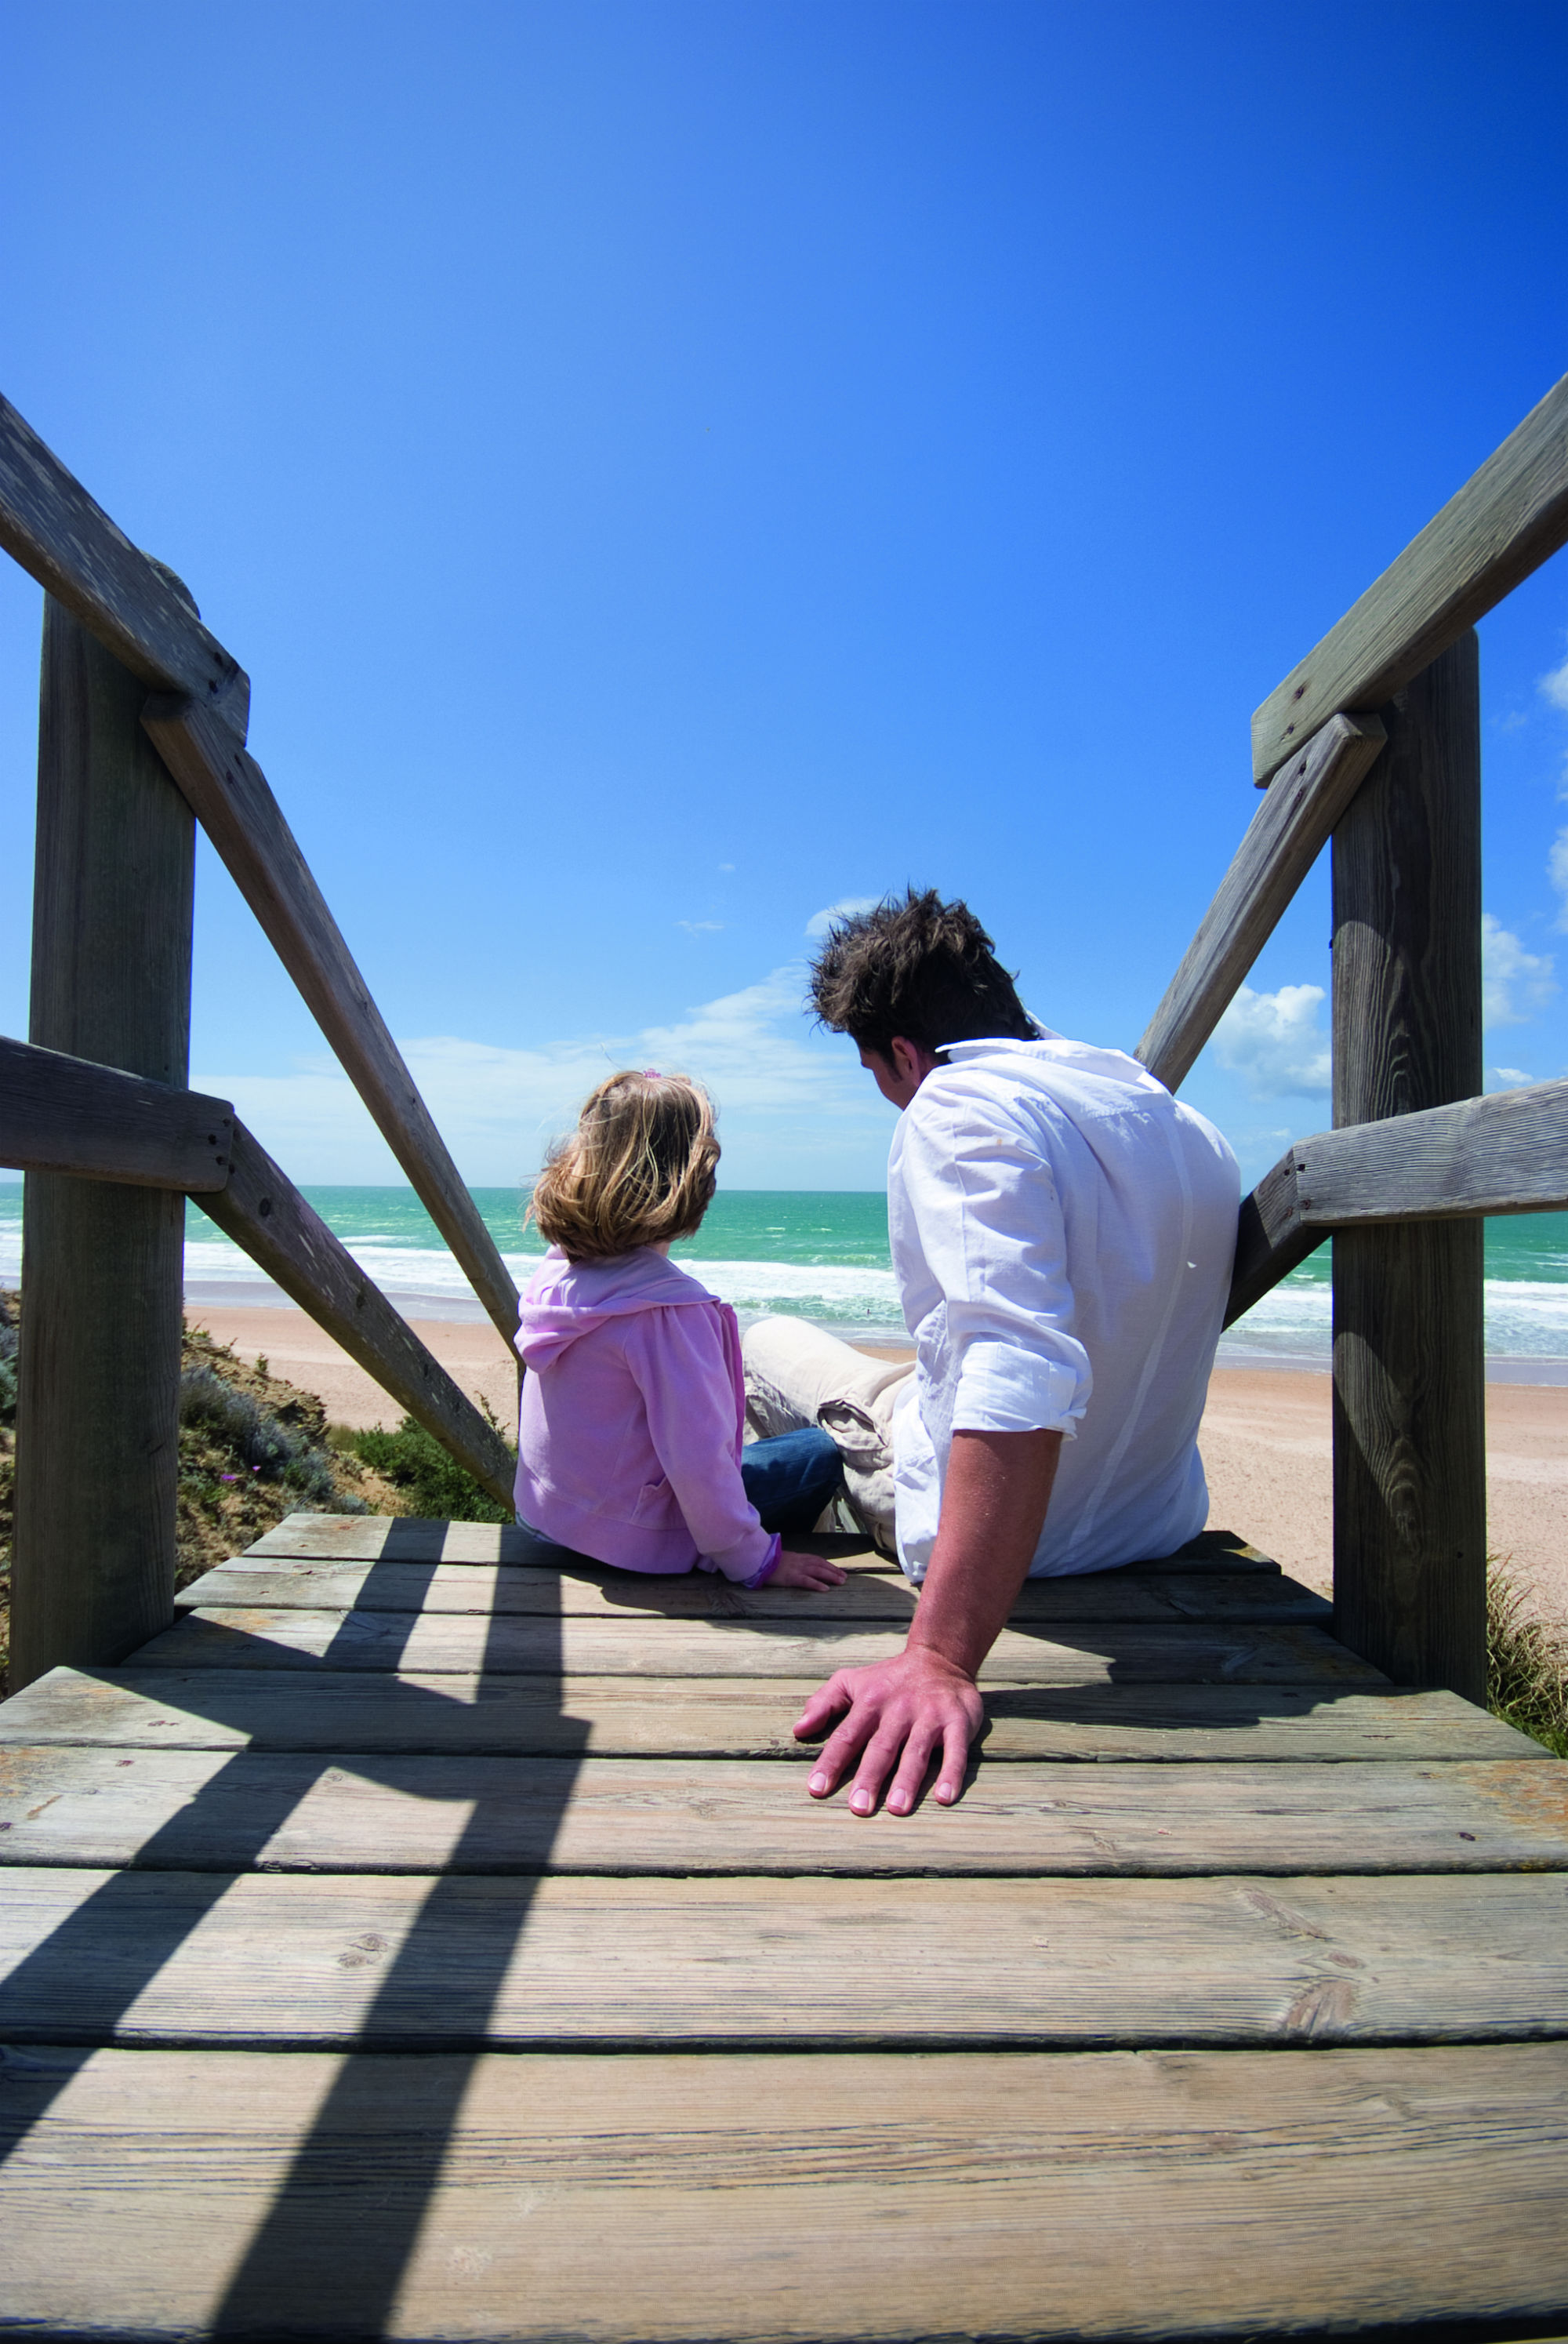 © Aldiana Andalusien: Perfekter Familienurlaub